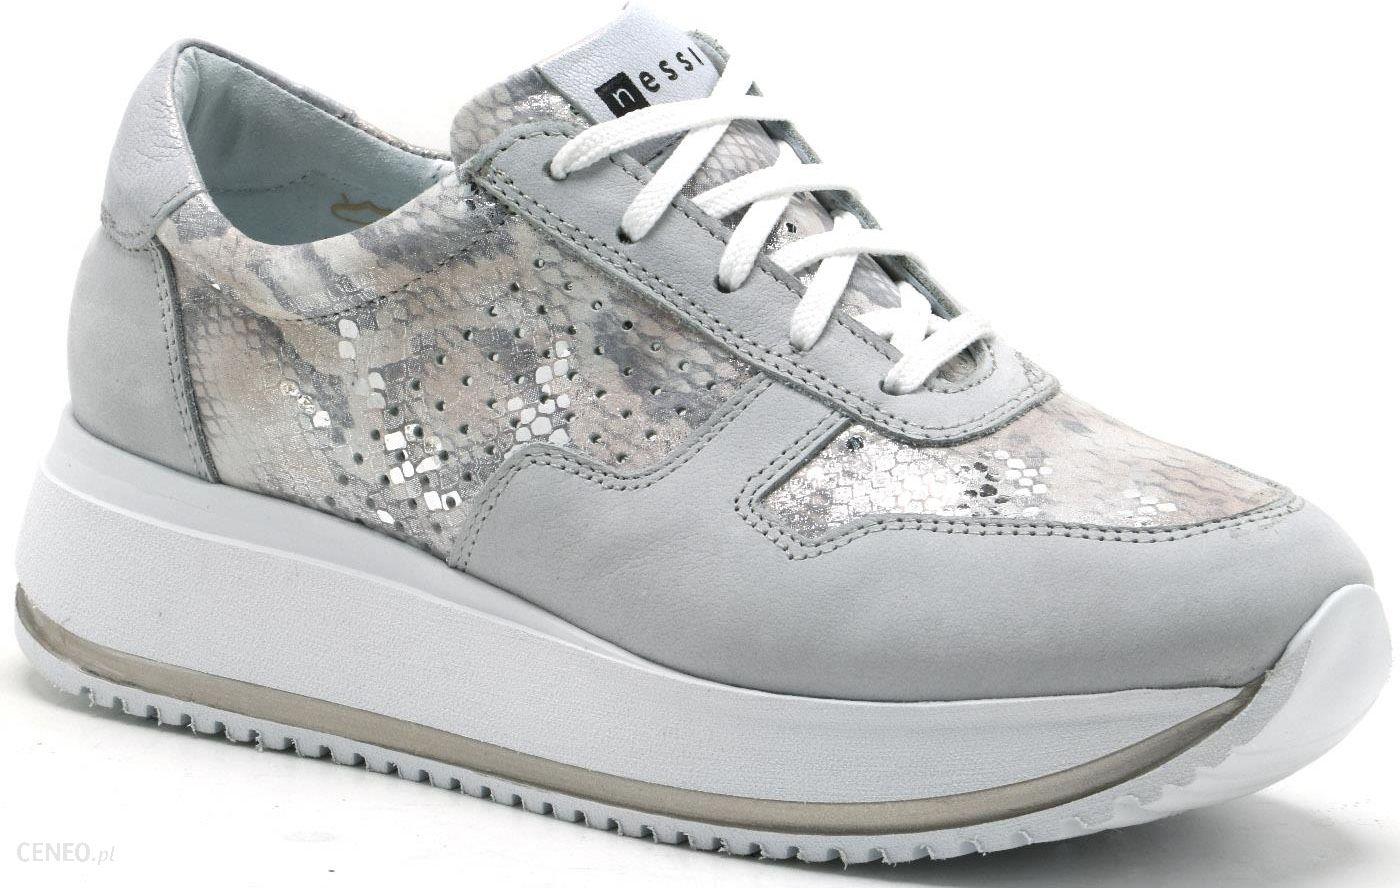 e1d4ef5e209a4 Sneakersy NESSI-18324 - Ceny i opinie - Ceneo.pl